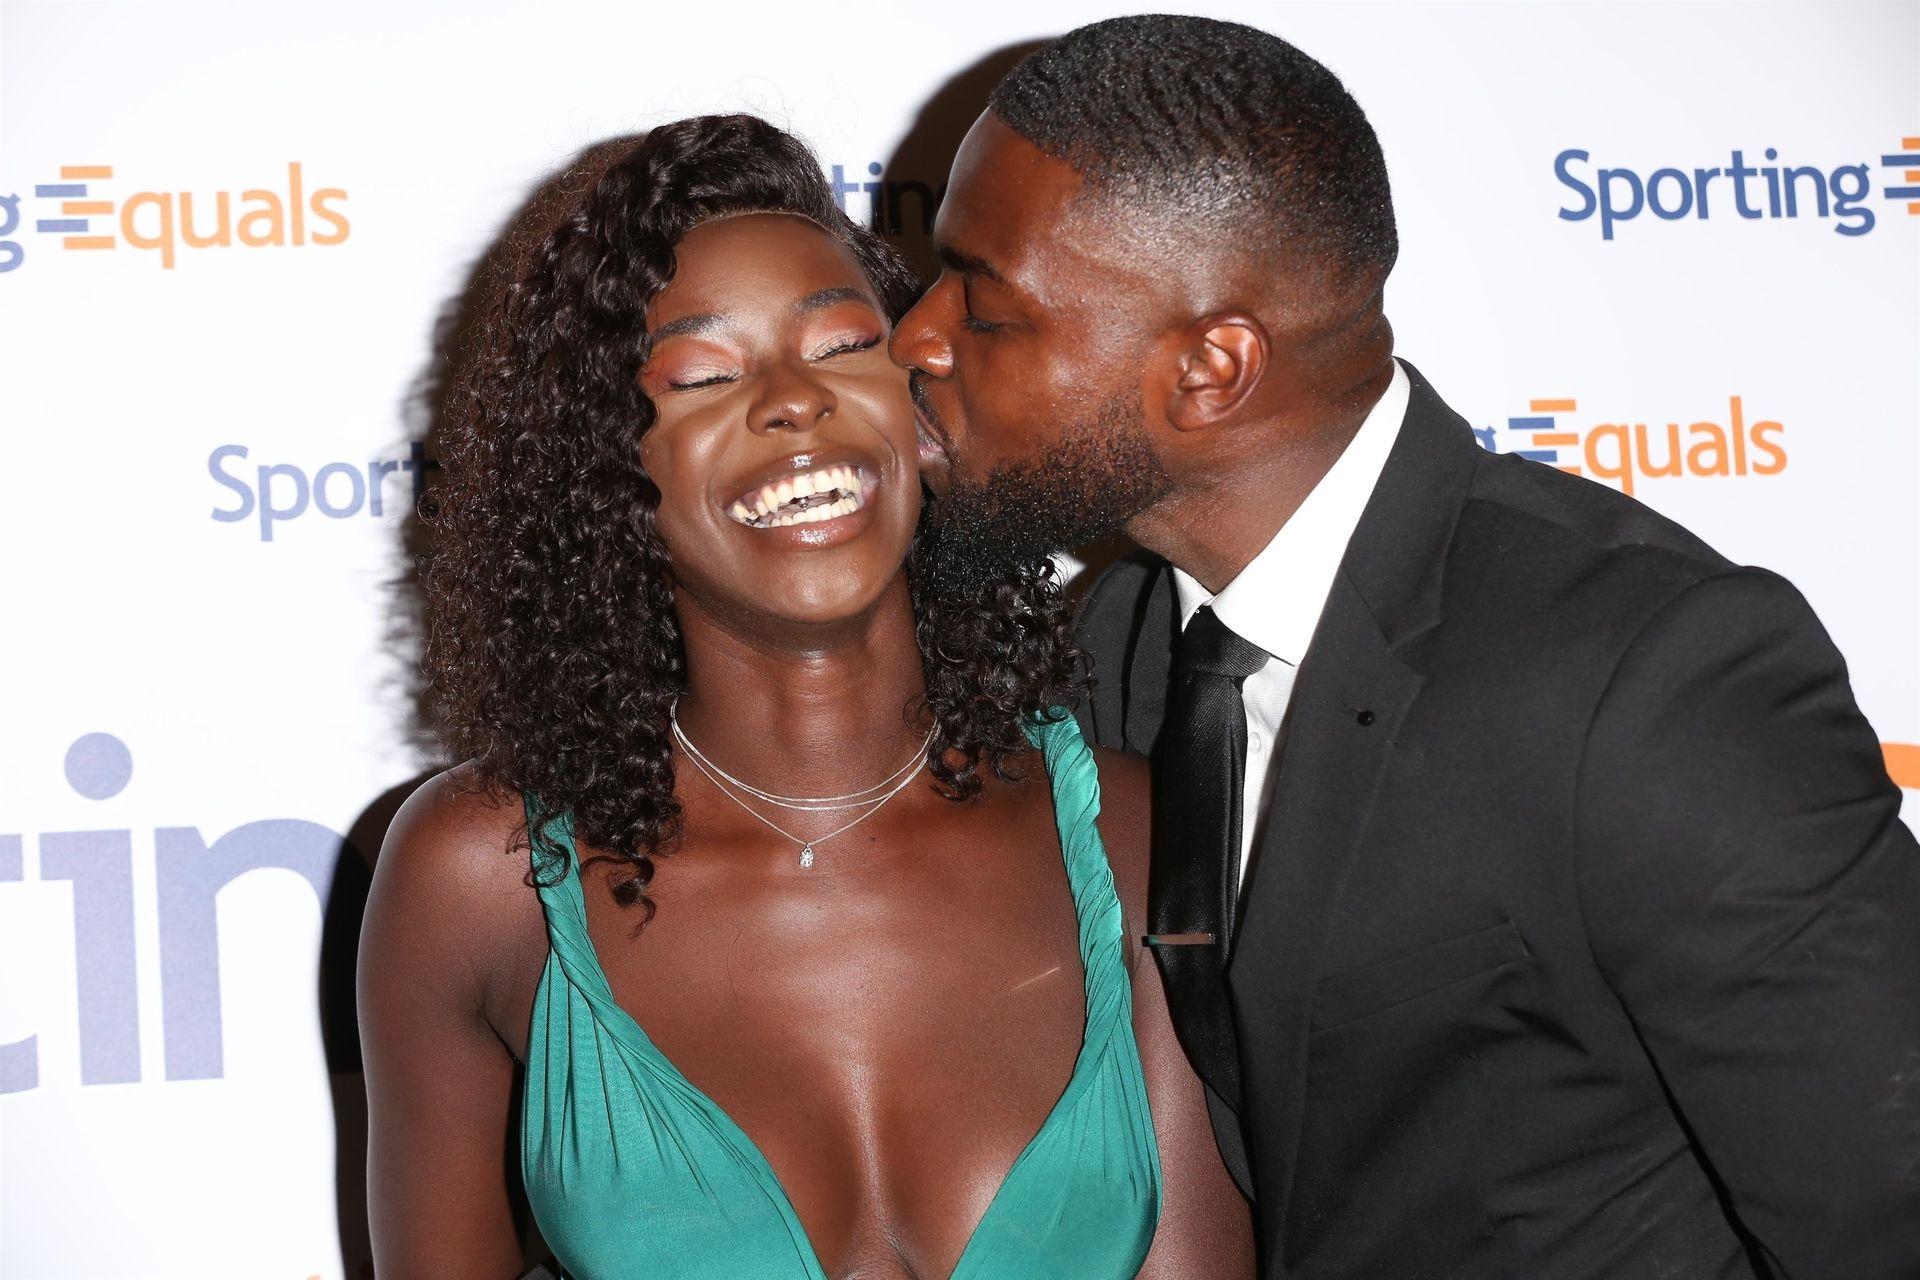 Mike Boateng & Priscilla Anyabu Are Seen At British Ethnic Diversity Sports Awards 0101